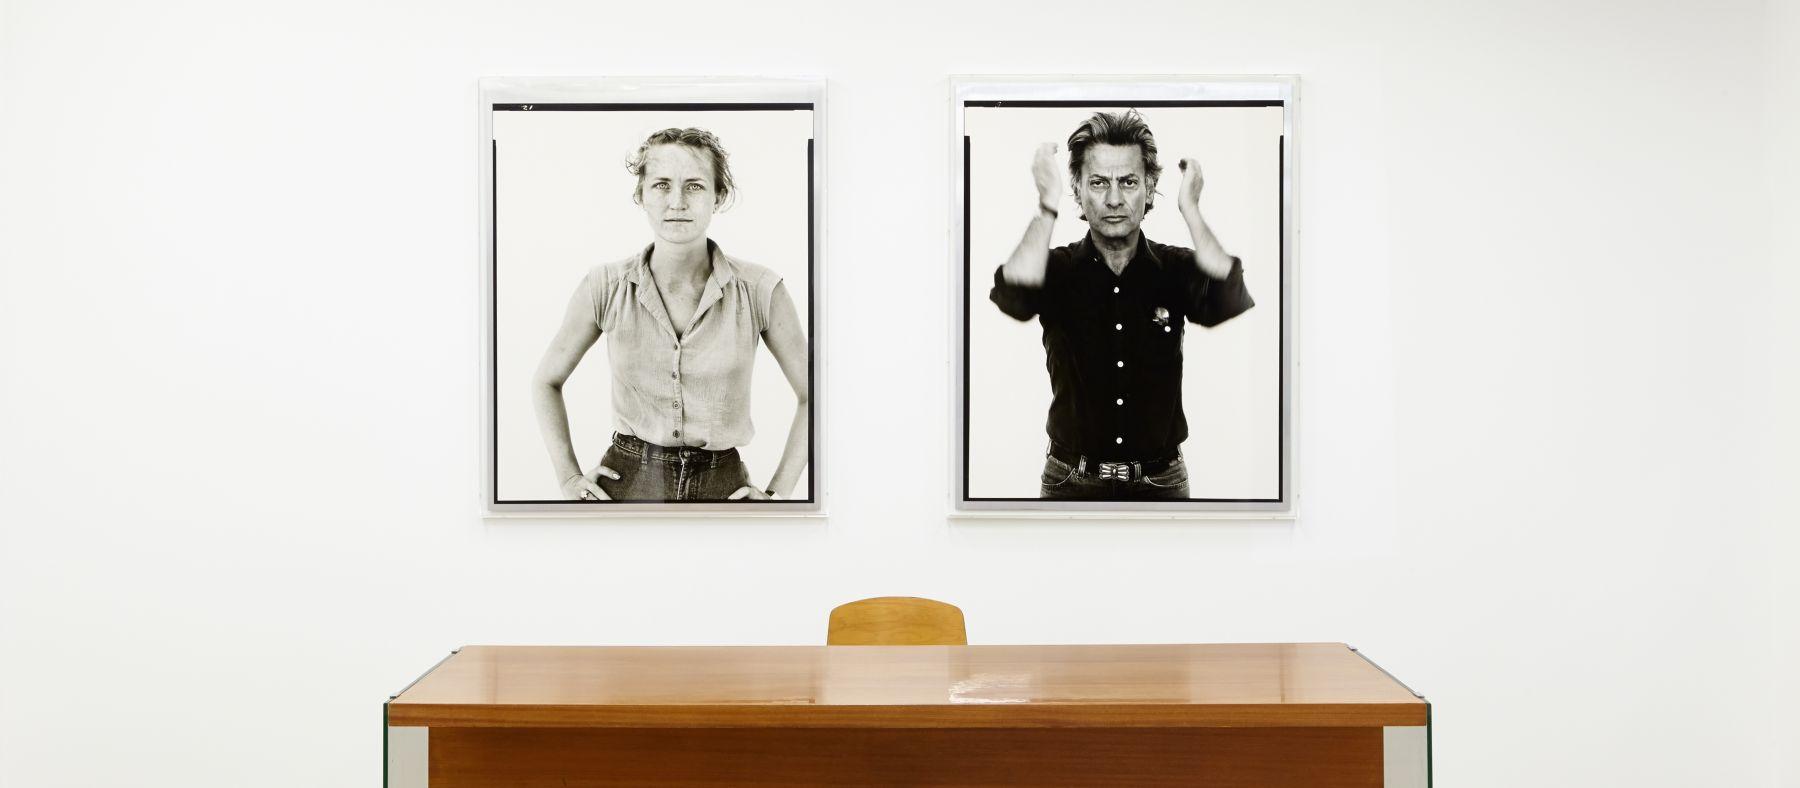 #RAWHIDE Richard Avedon Peggy Daniels, cashier, Giddings, Texas, May 7, 1981 Self-portrait, Photographer, Provo, Utah, August 20, 1980